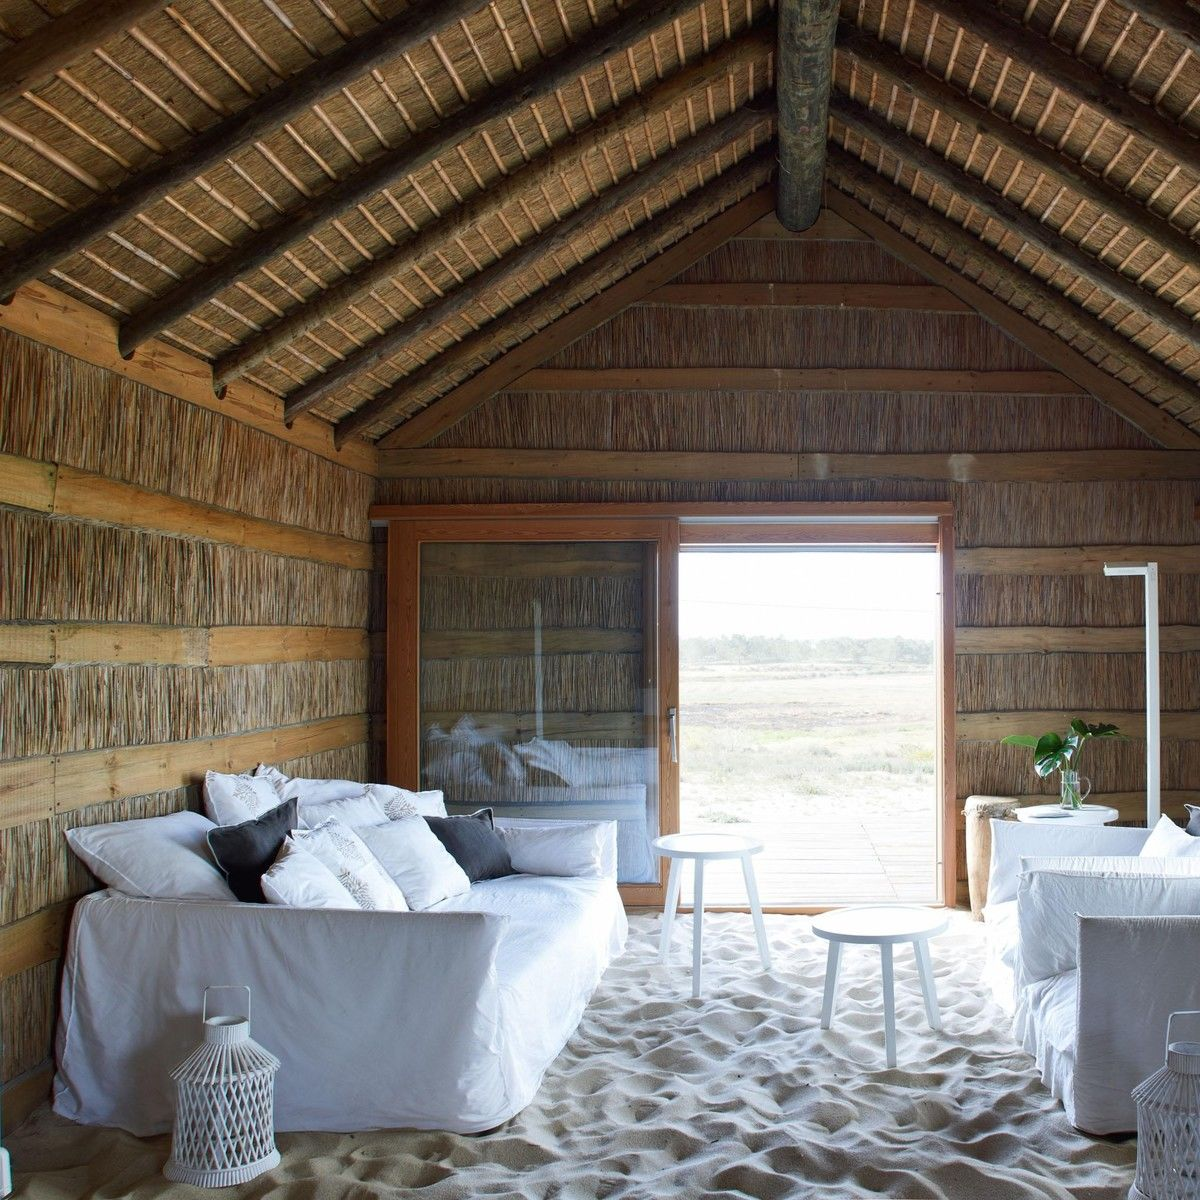 ghost 16 sofa gervasoni. Black Bedroom Furniture Sets. Home Design Ideas